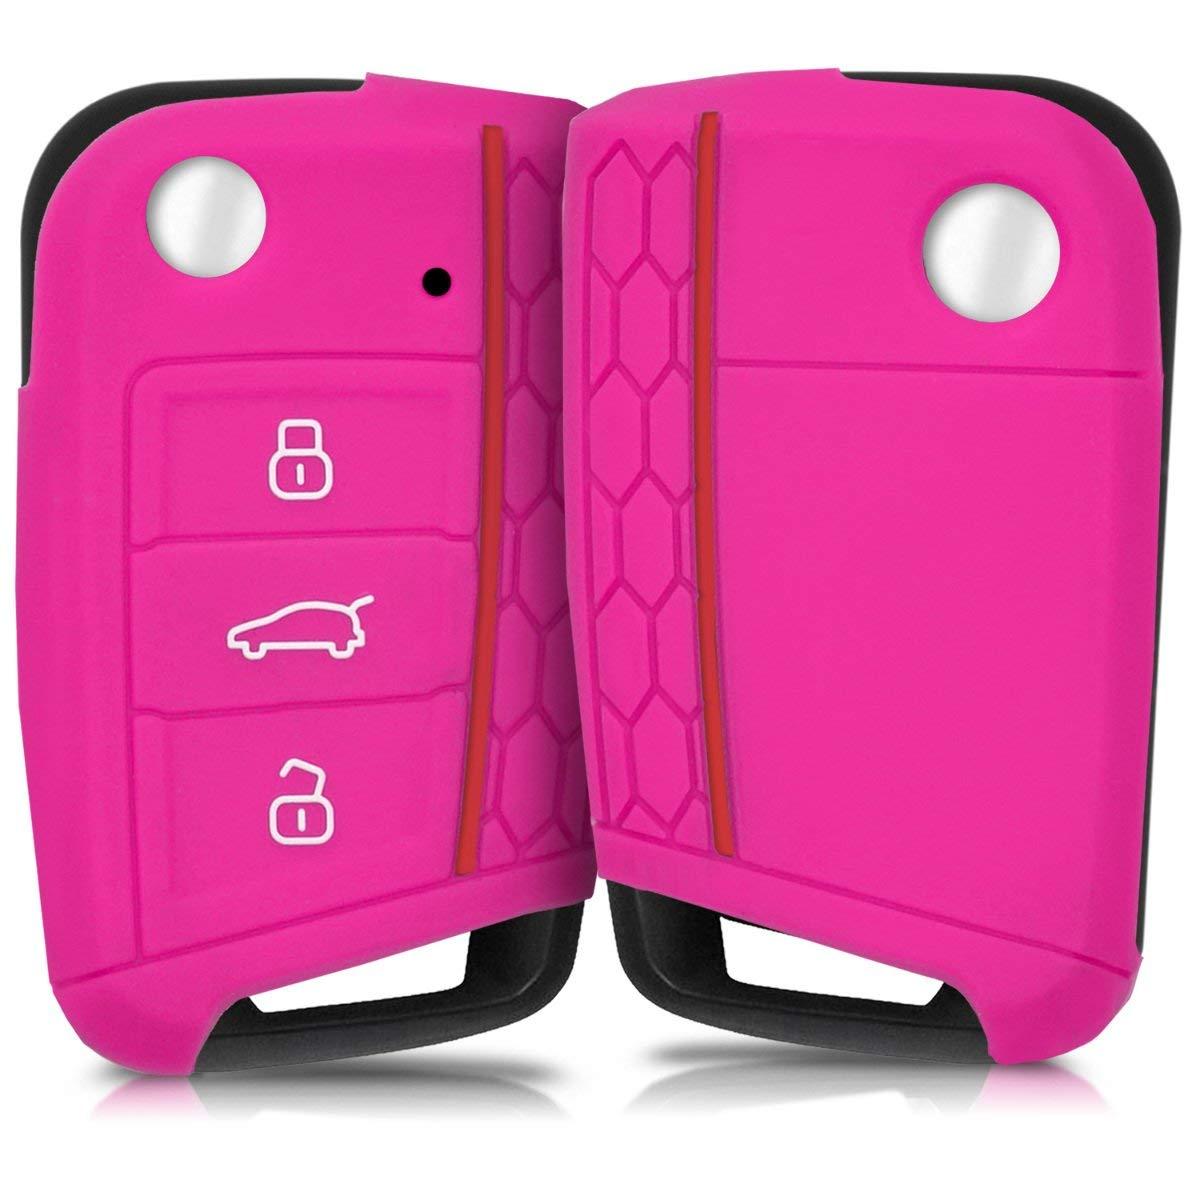 kwmobile VW Golf 7 MK7 Car Key Cover - Silicone Protective Key Fob Cover for VW Golf 7 MK7 3 Button Car Key - dark pink